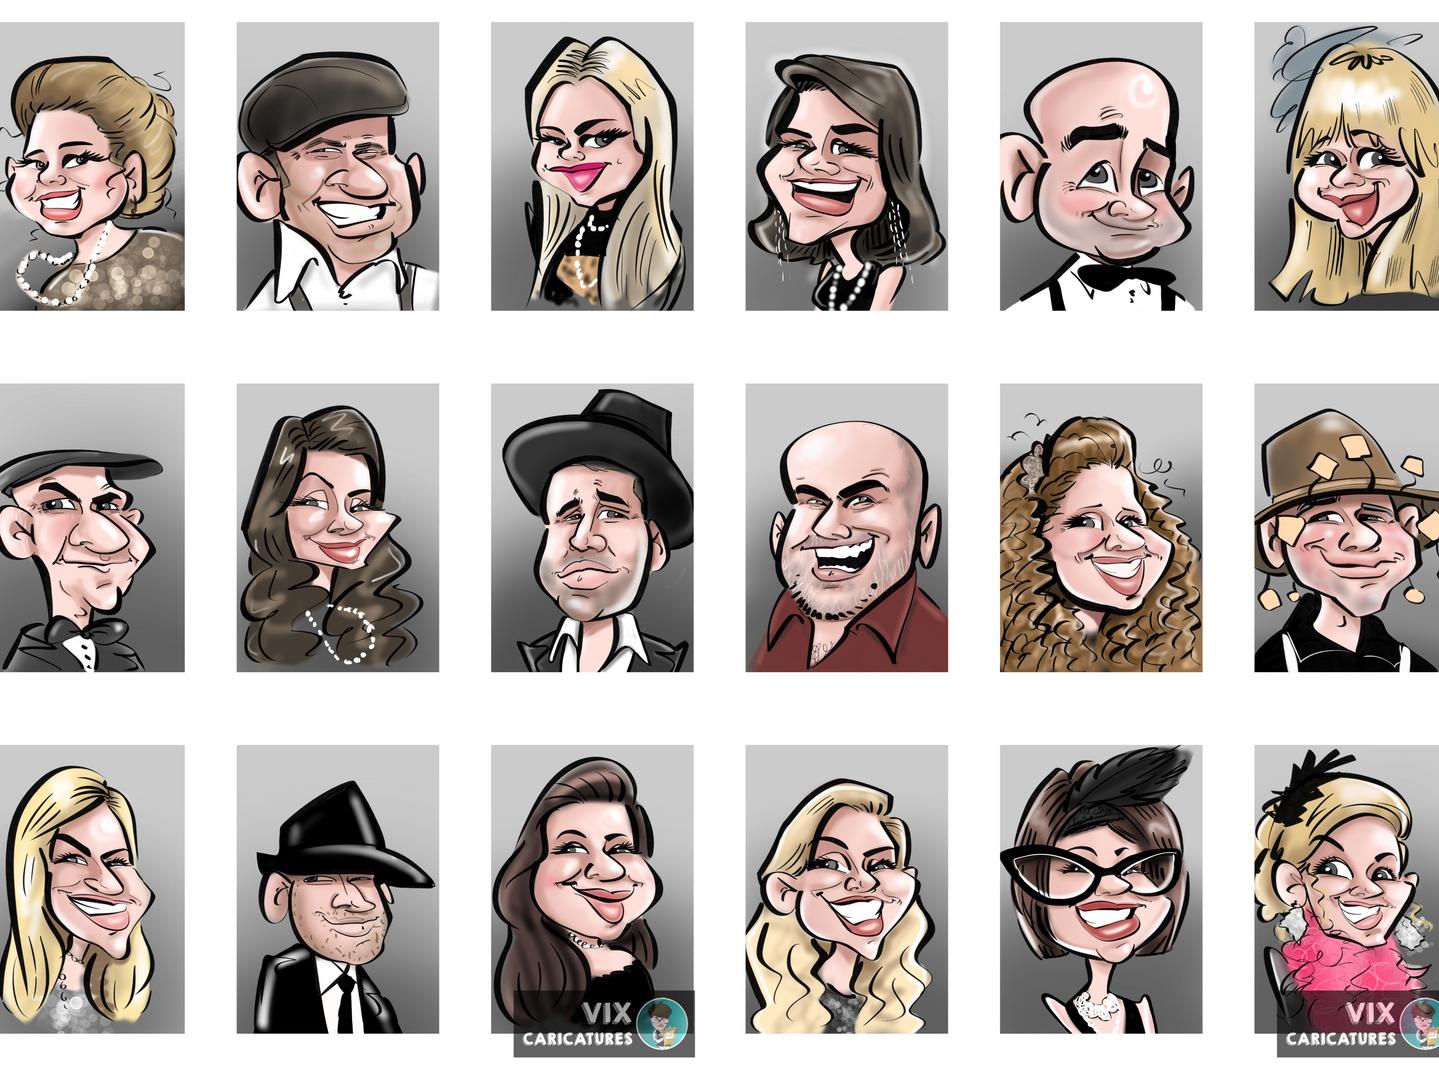 vix_caricatures (1).png